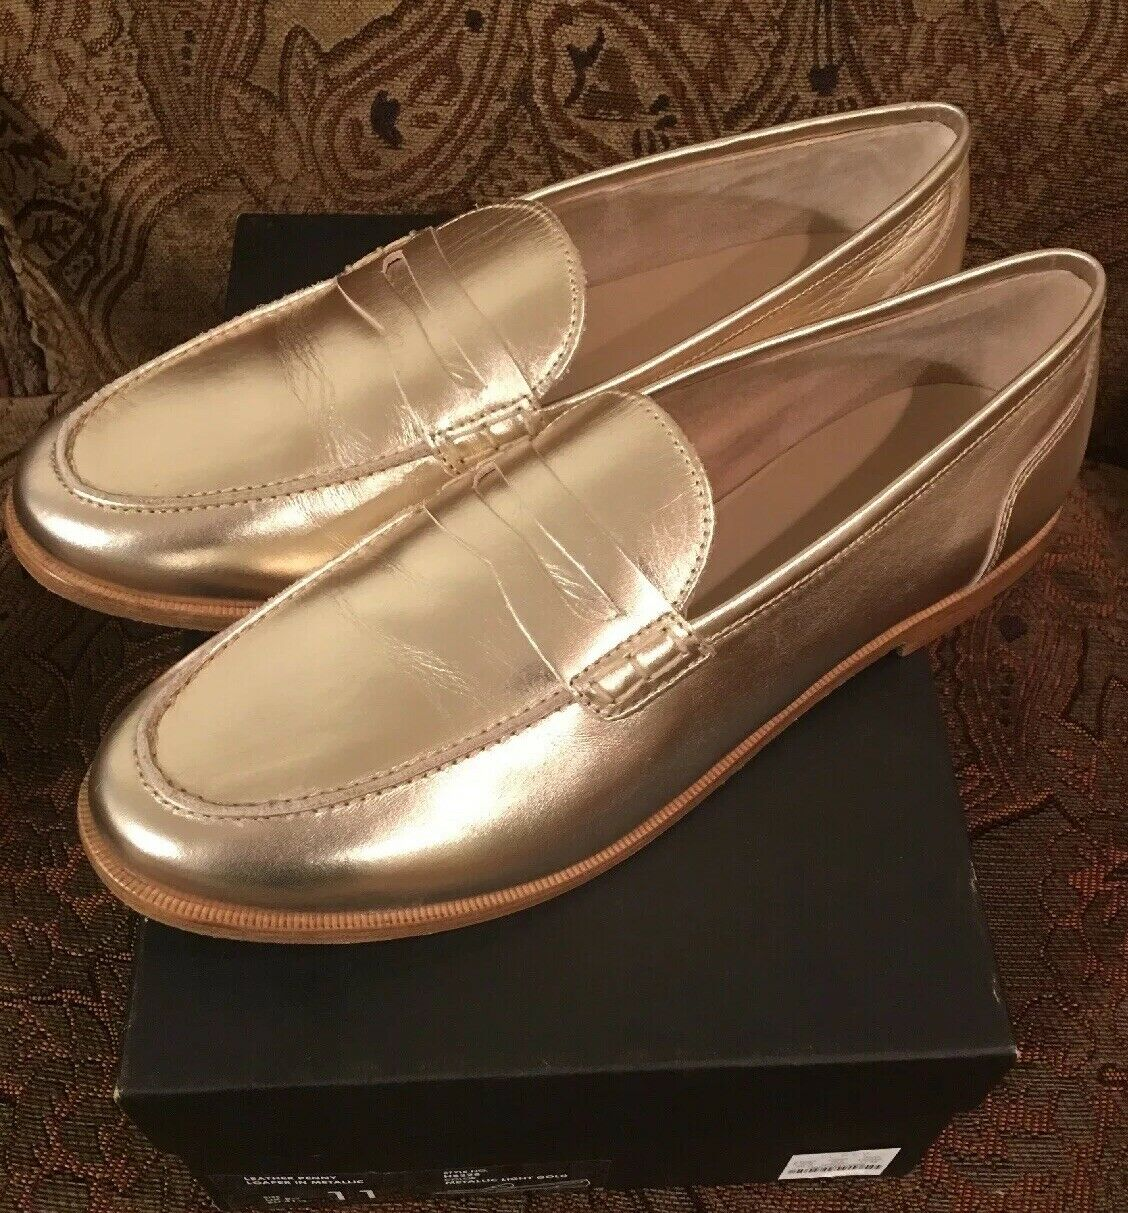 NIB JCREW  158 Ryan penny loafers in metallic leather Sz11 H8228 Light gold